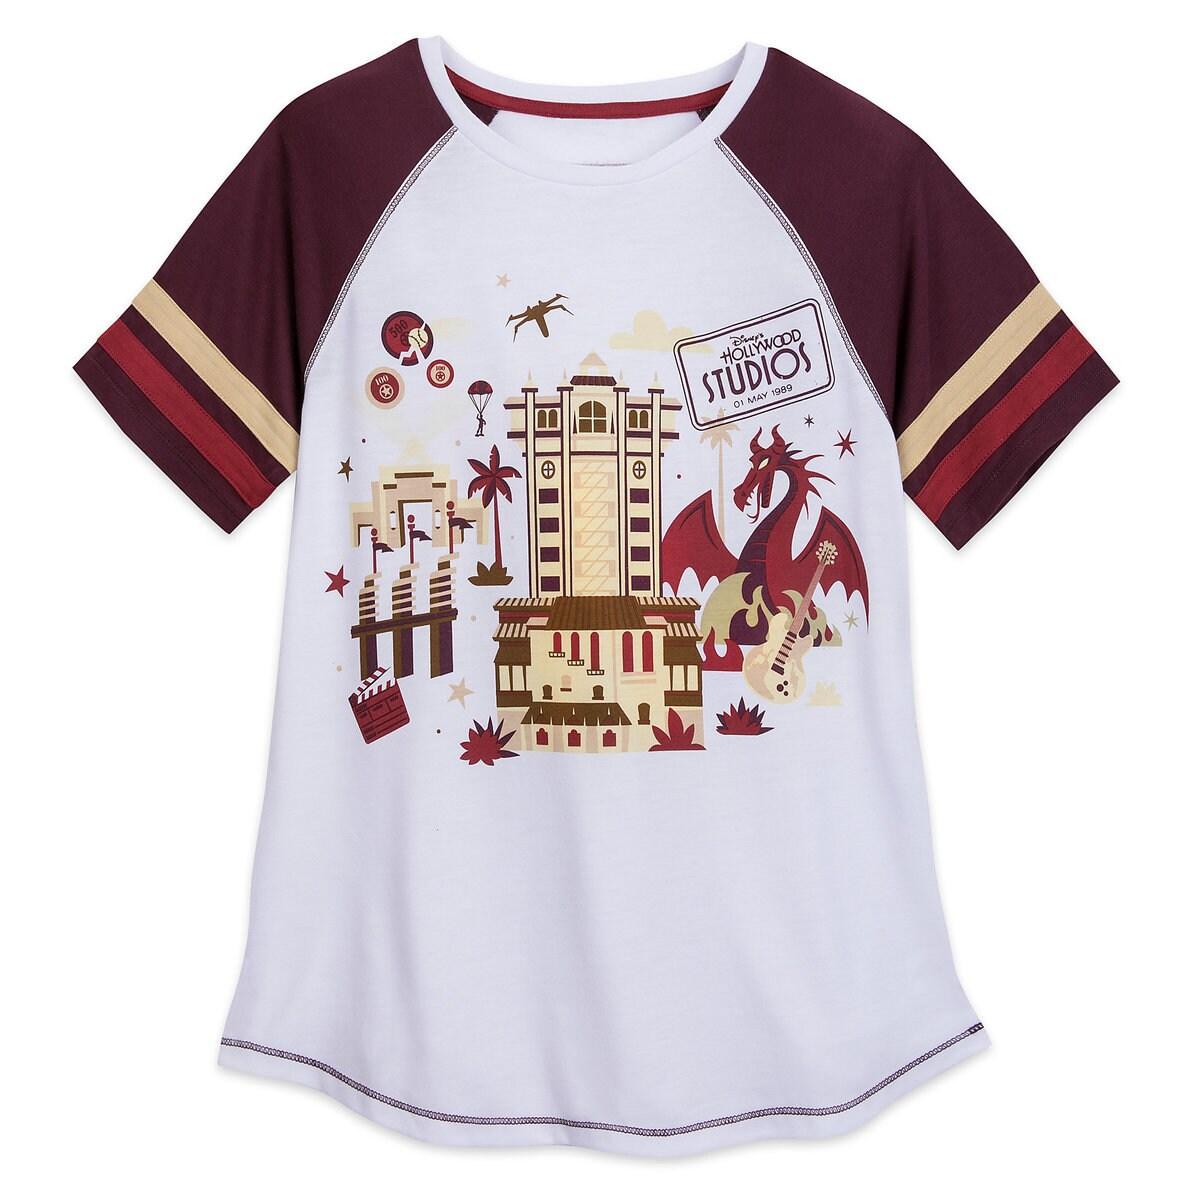 de27c5aeb546de Product Image of Disney s Hollywood Studios Raglan T-Shirt for Women   1